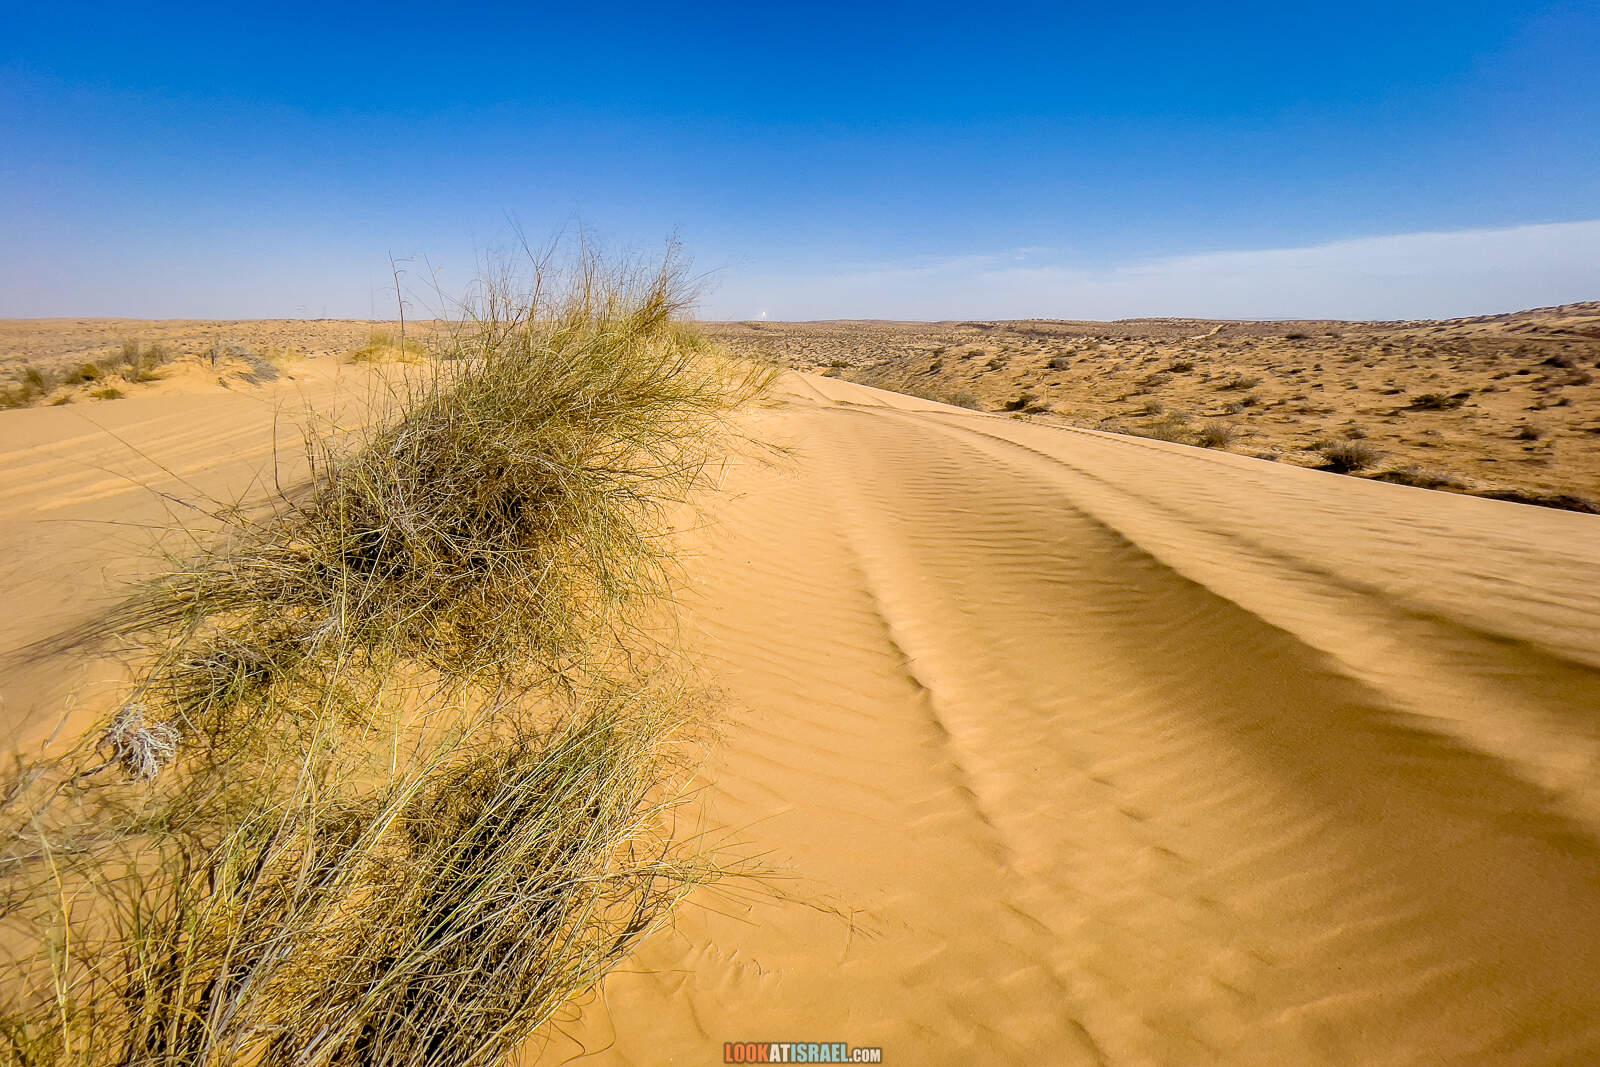 Большая дюна в нахаль лаван, каньон а-лес (лёсс) и пески Халуца, Агур | דיונה גדולה קניון הלס חולות חלוצה שונרה עגור | LookAtIsrael.com - Фото путешествия по Израилю